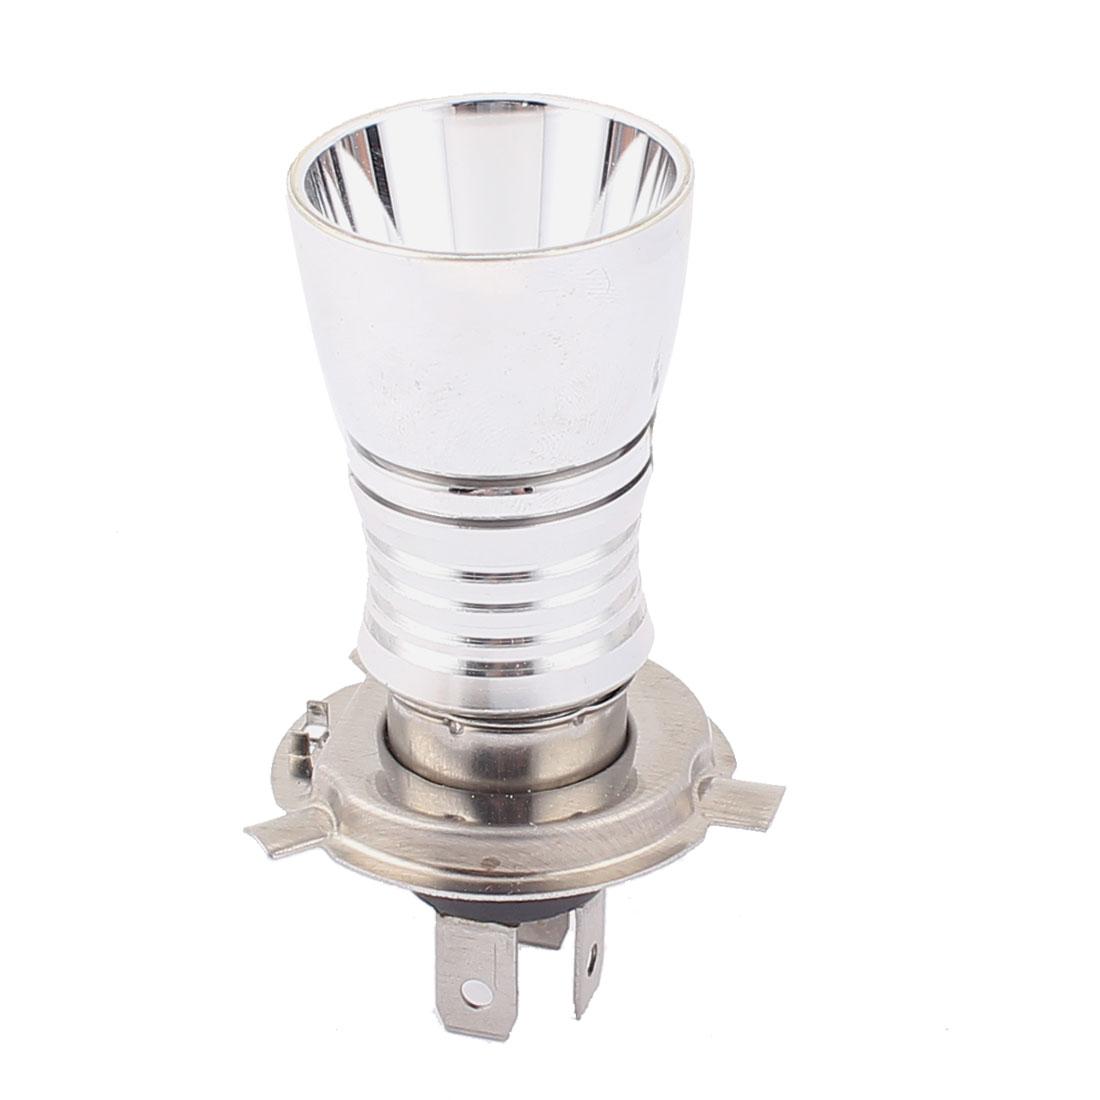 Sliver Tone Shell H4 5W White Motorcycle Moto LED Headlight Lamp Bulb